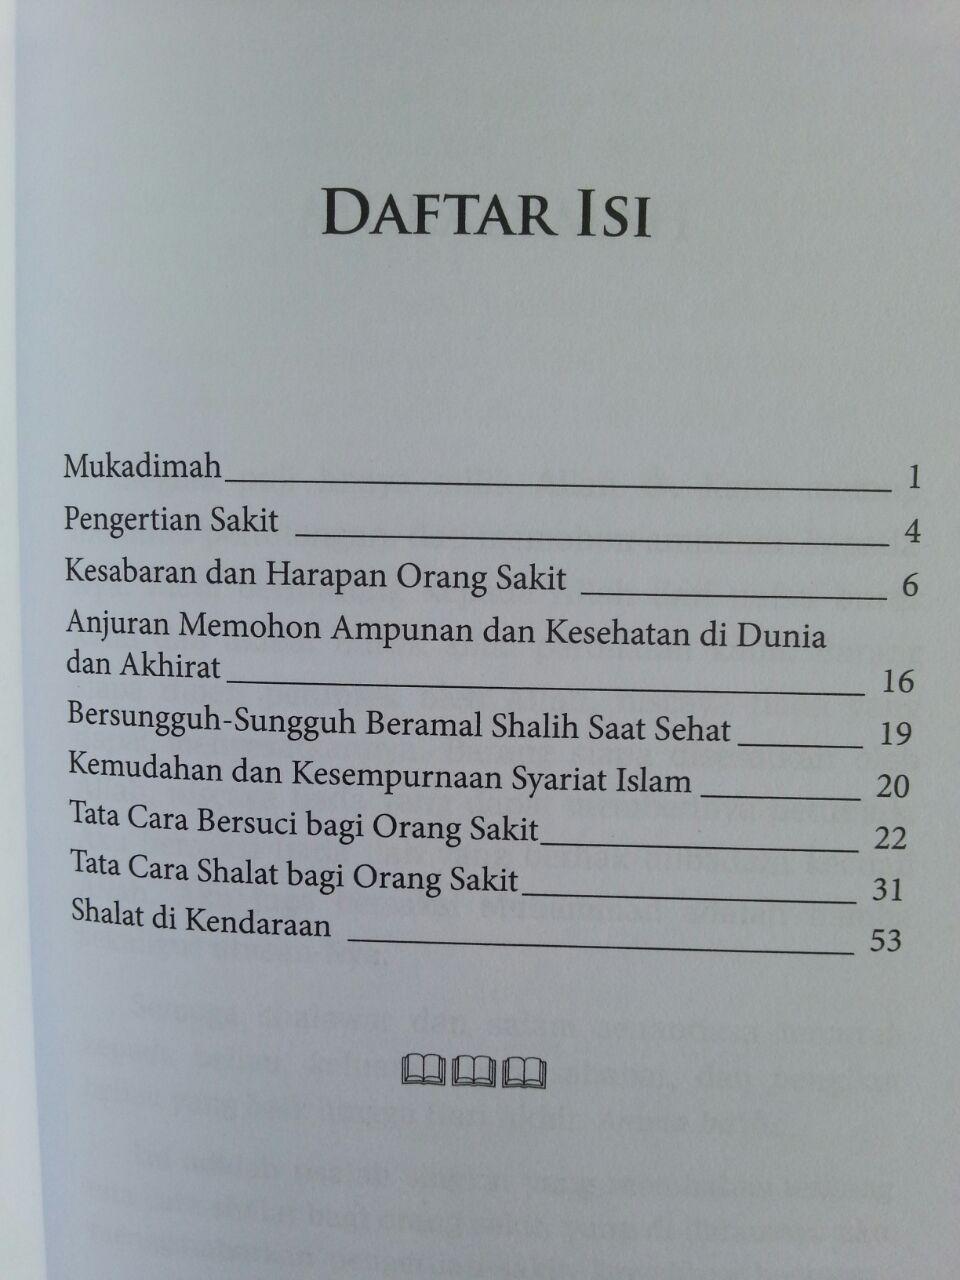 Buku Tata Cara Shalat Bagi Orang Sakit isi 2